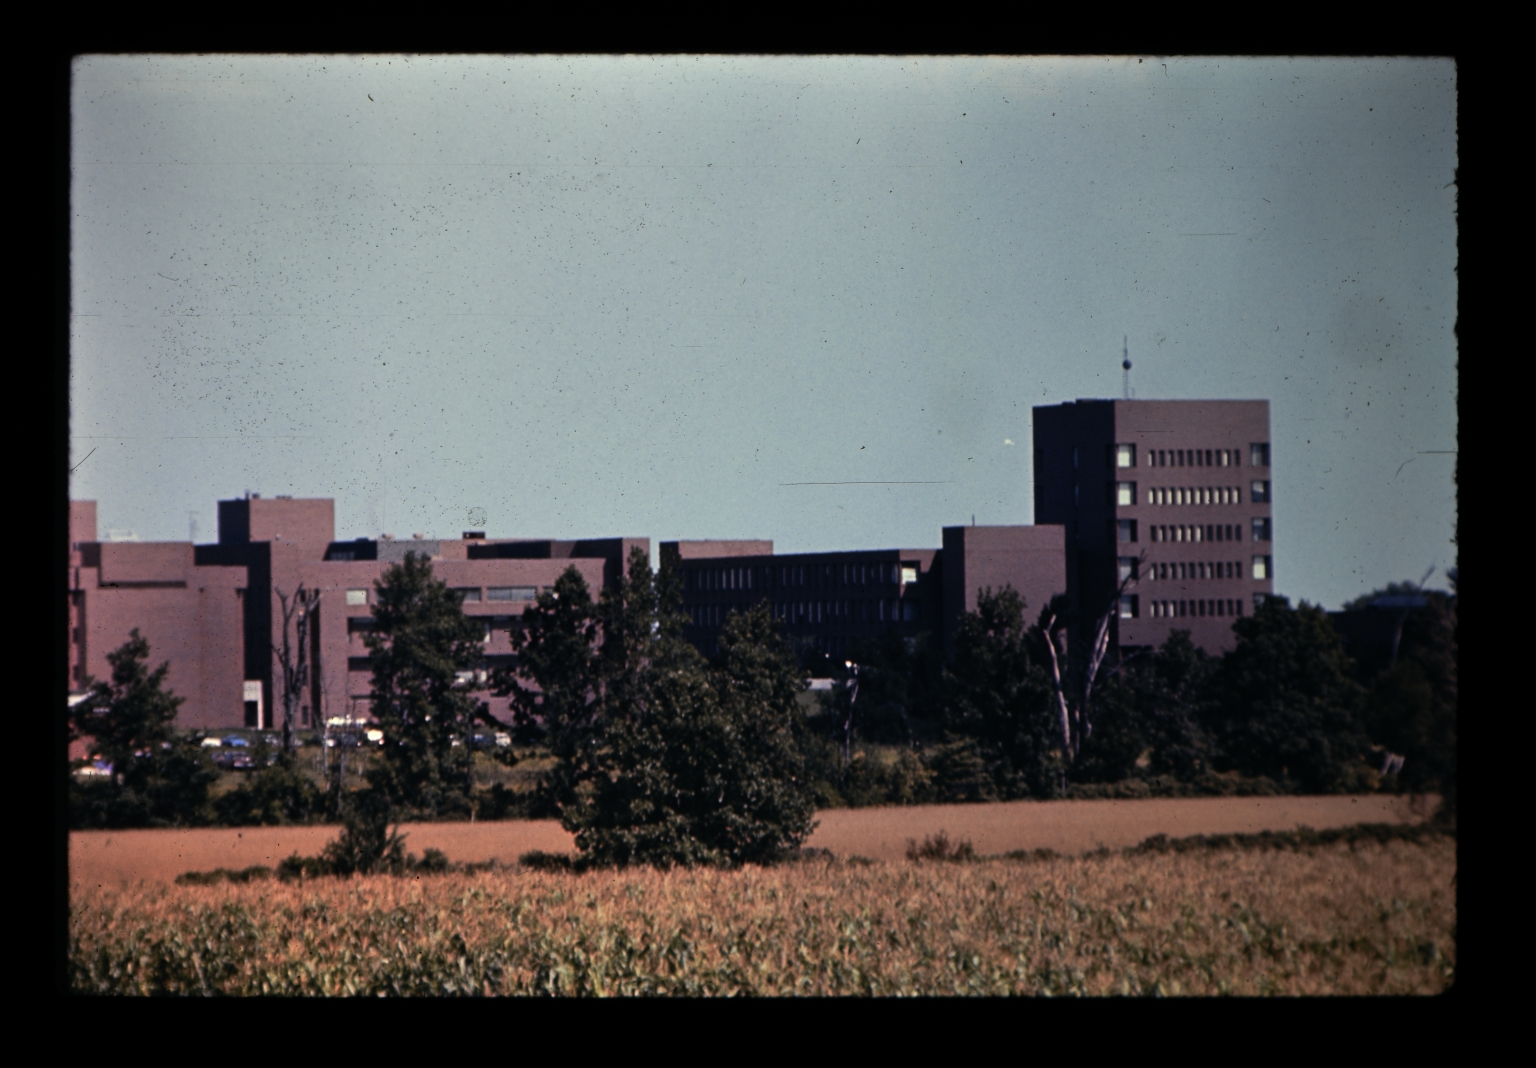 Academic buildings on RIT's Henrietta campus